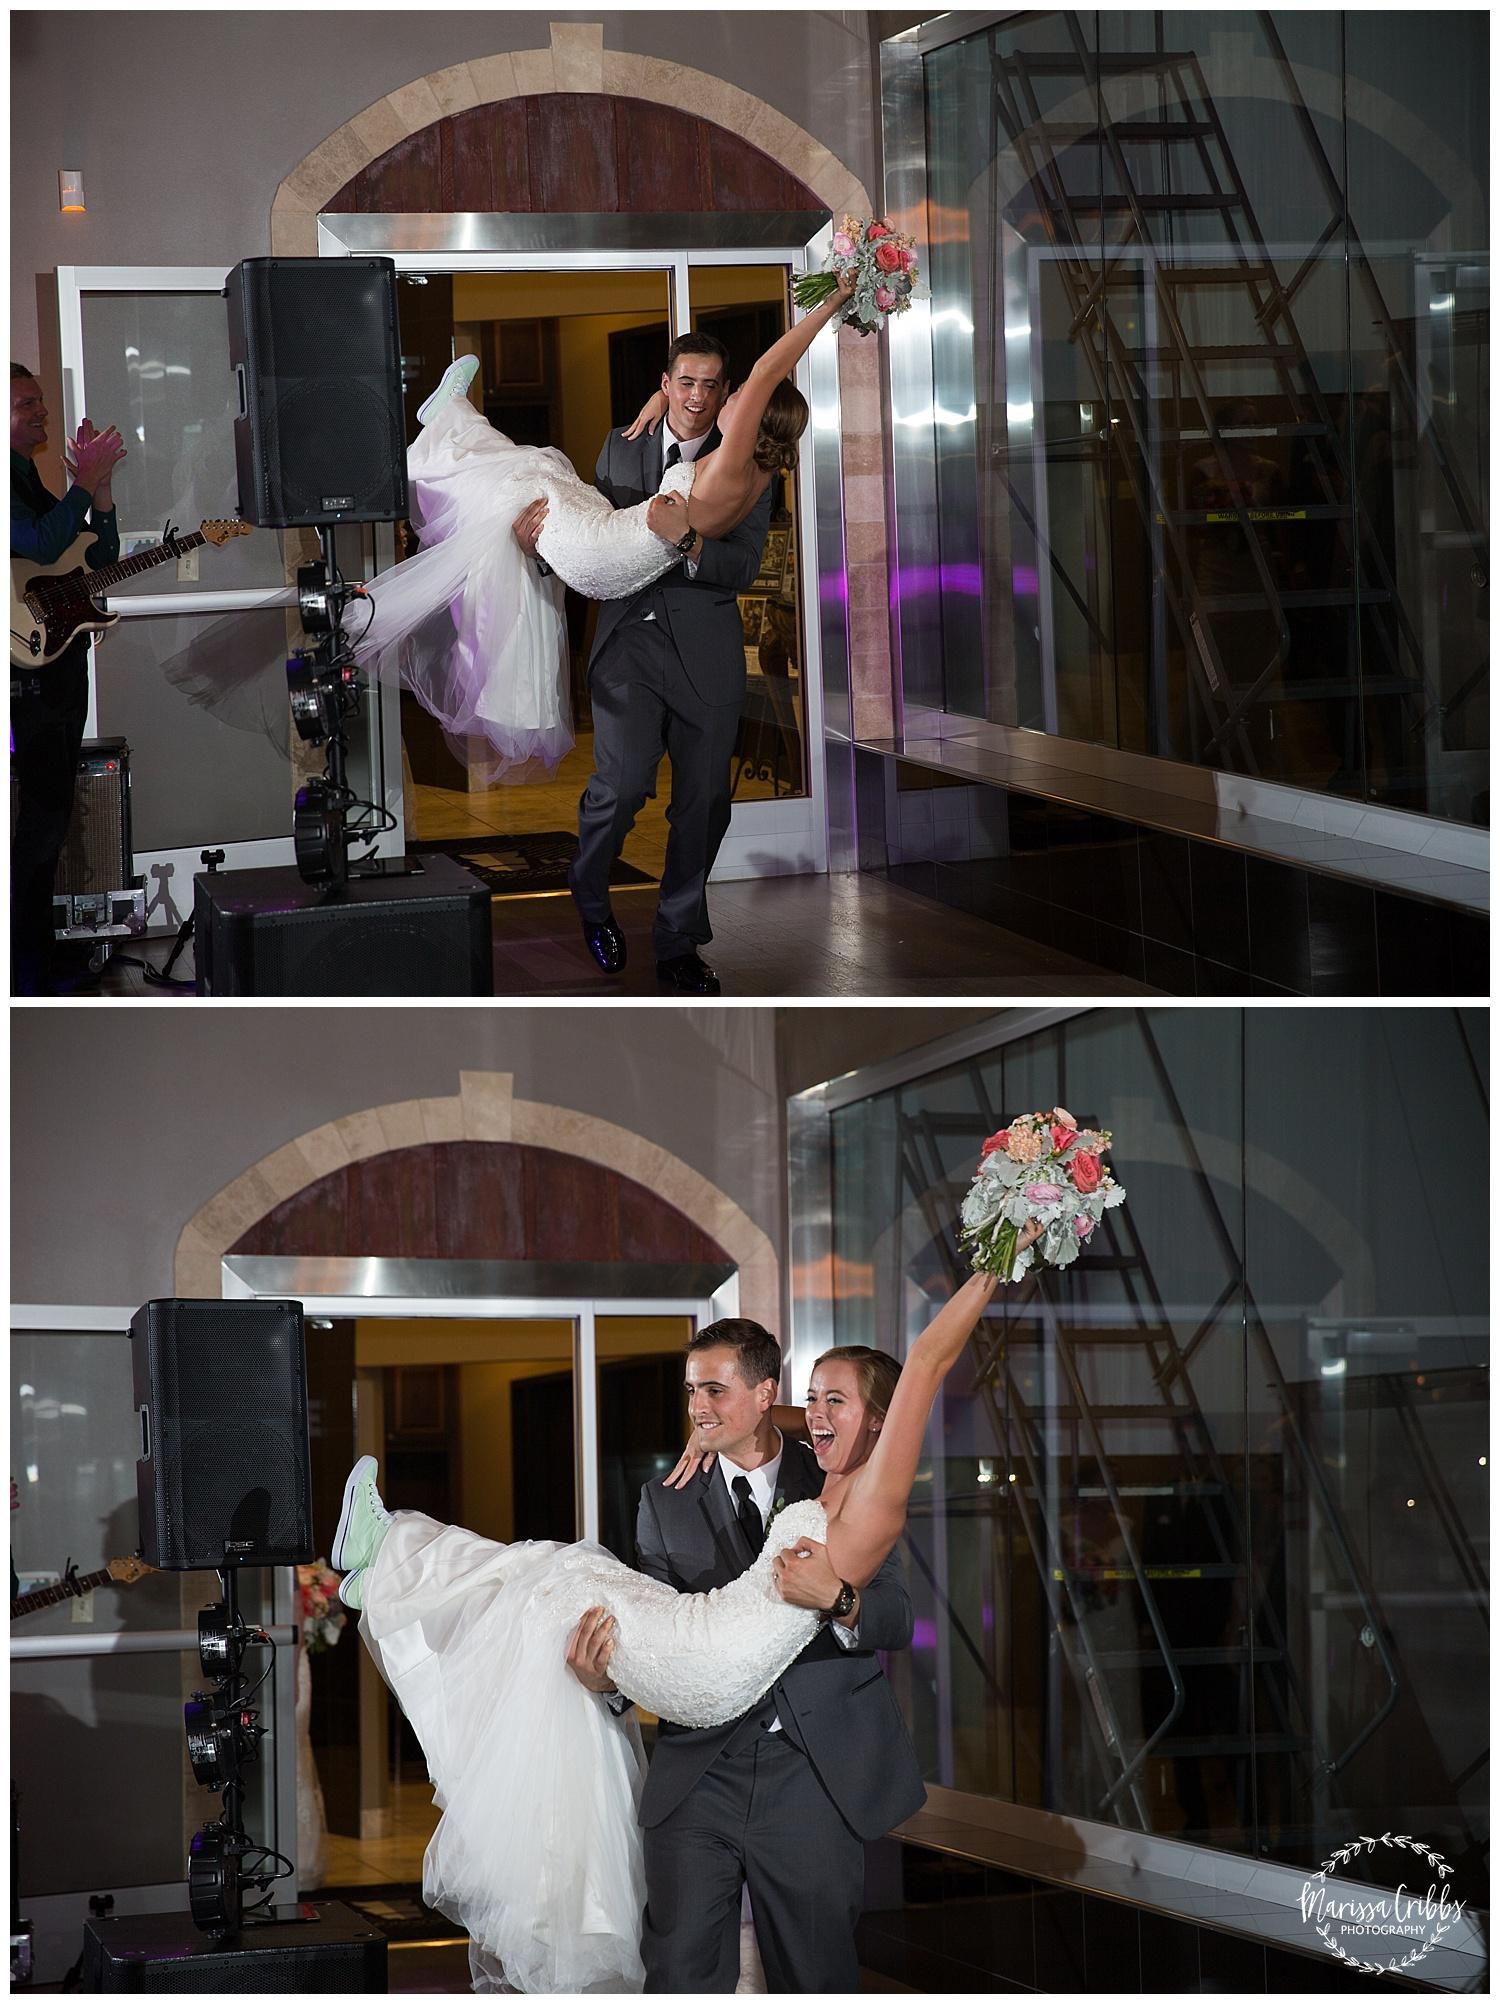 Twin Double Wedding | Union Horse Distilling Co. | Marissa Cribbs Photography | KC Weddings_0178.jpg